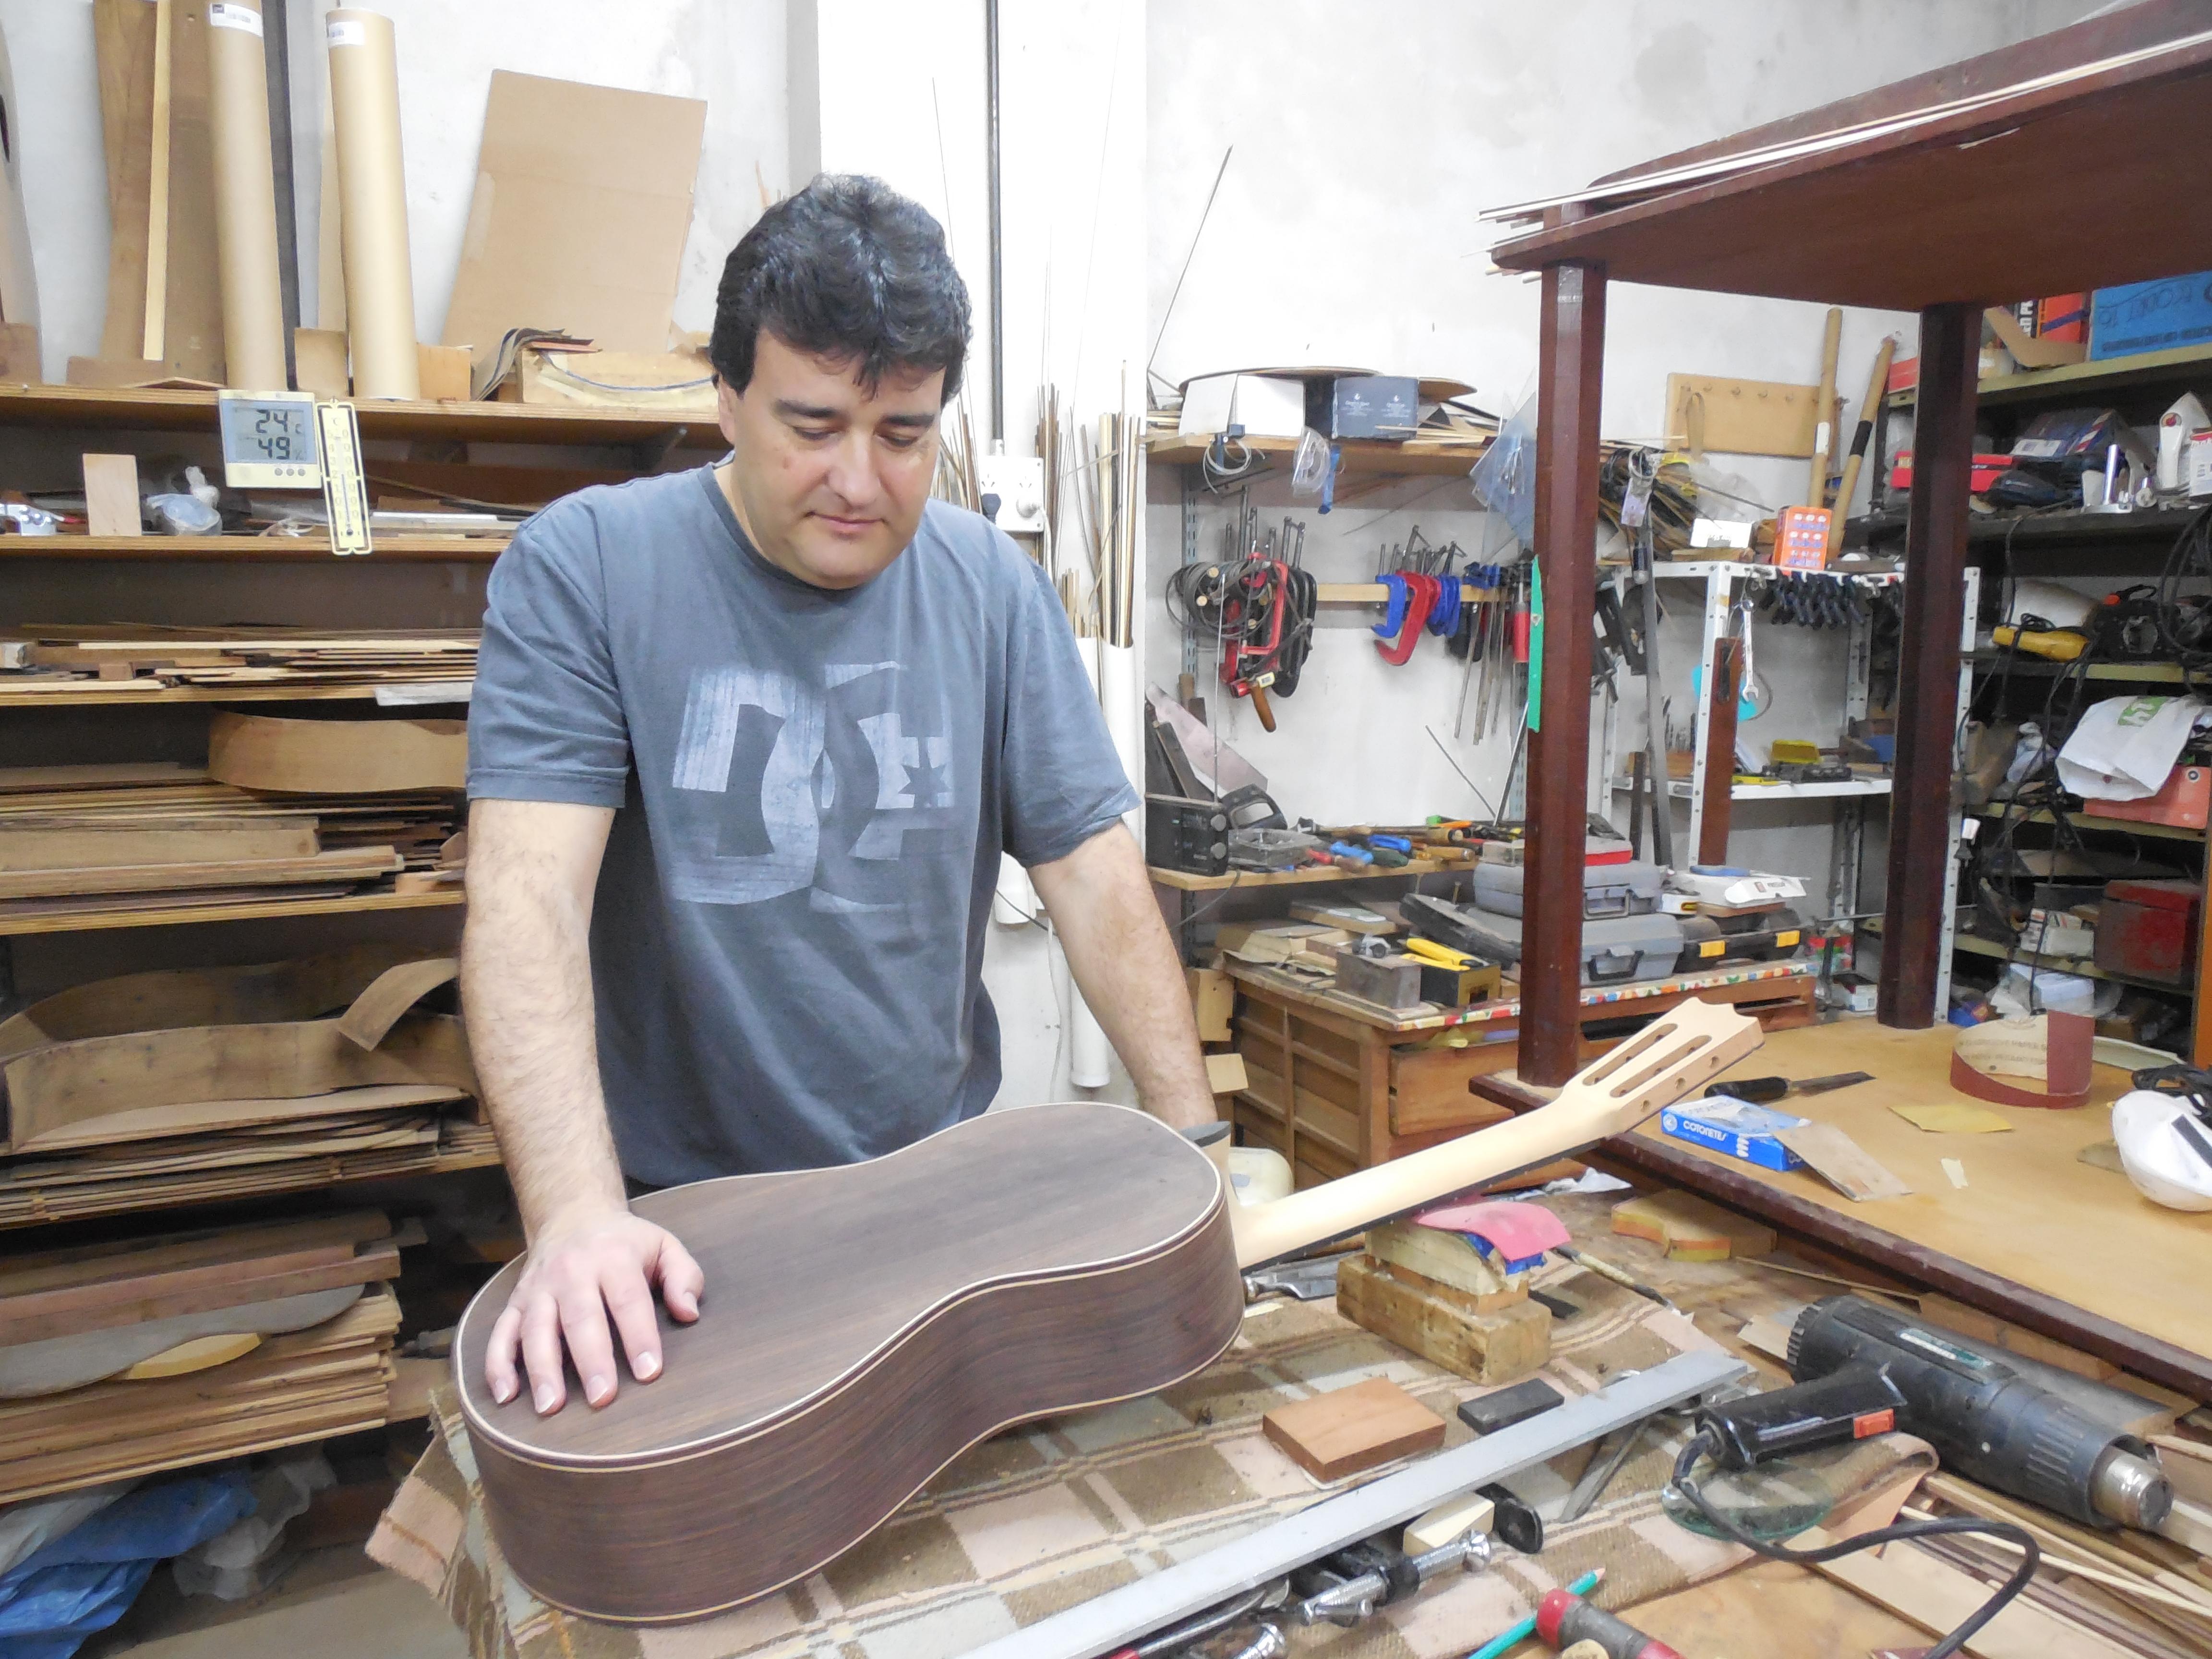 Taller de Mateo Crespi (Luthier) - Mateo Crespi Luthier